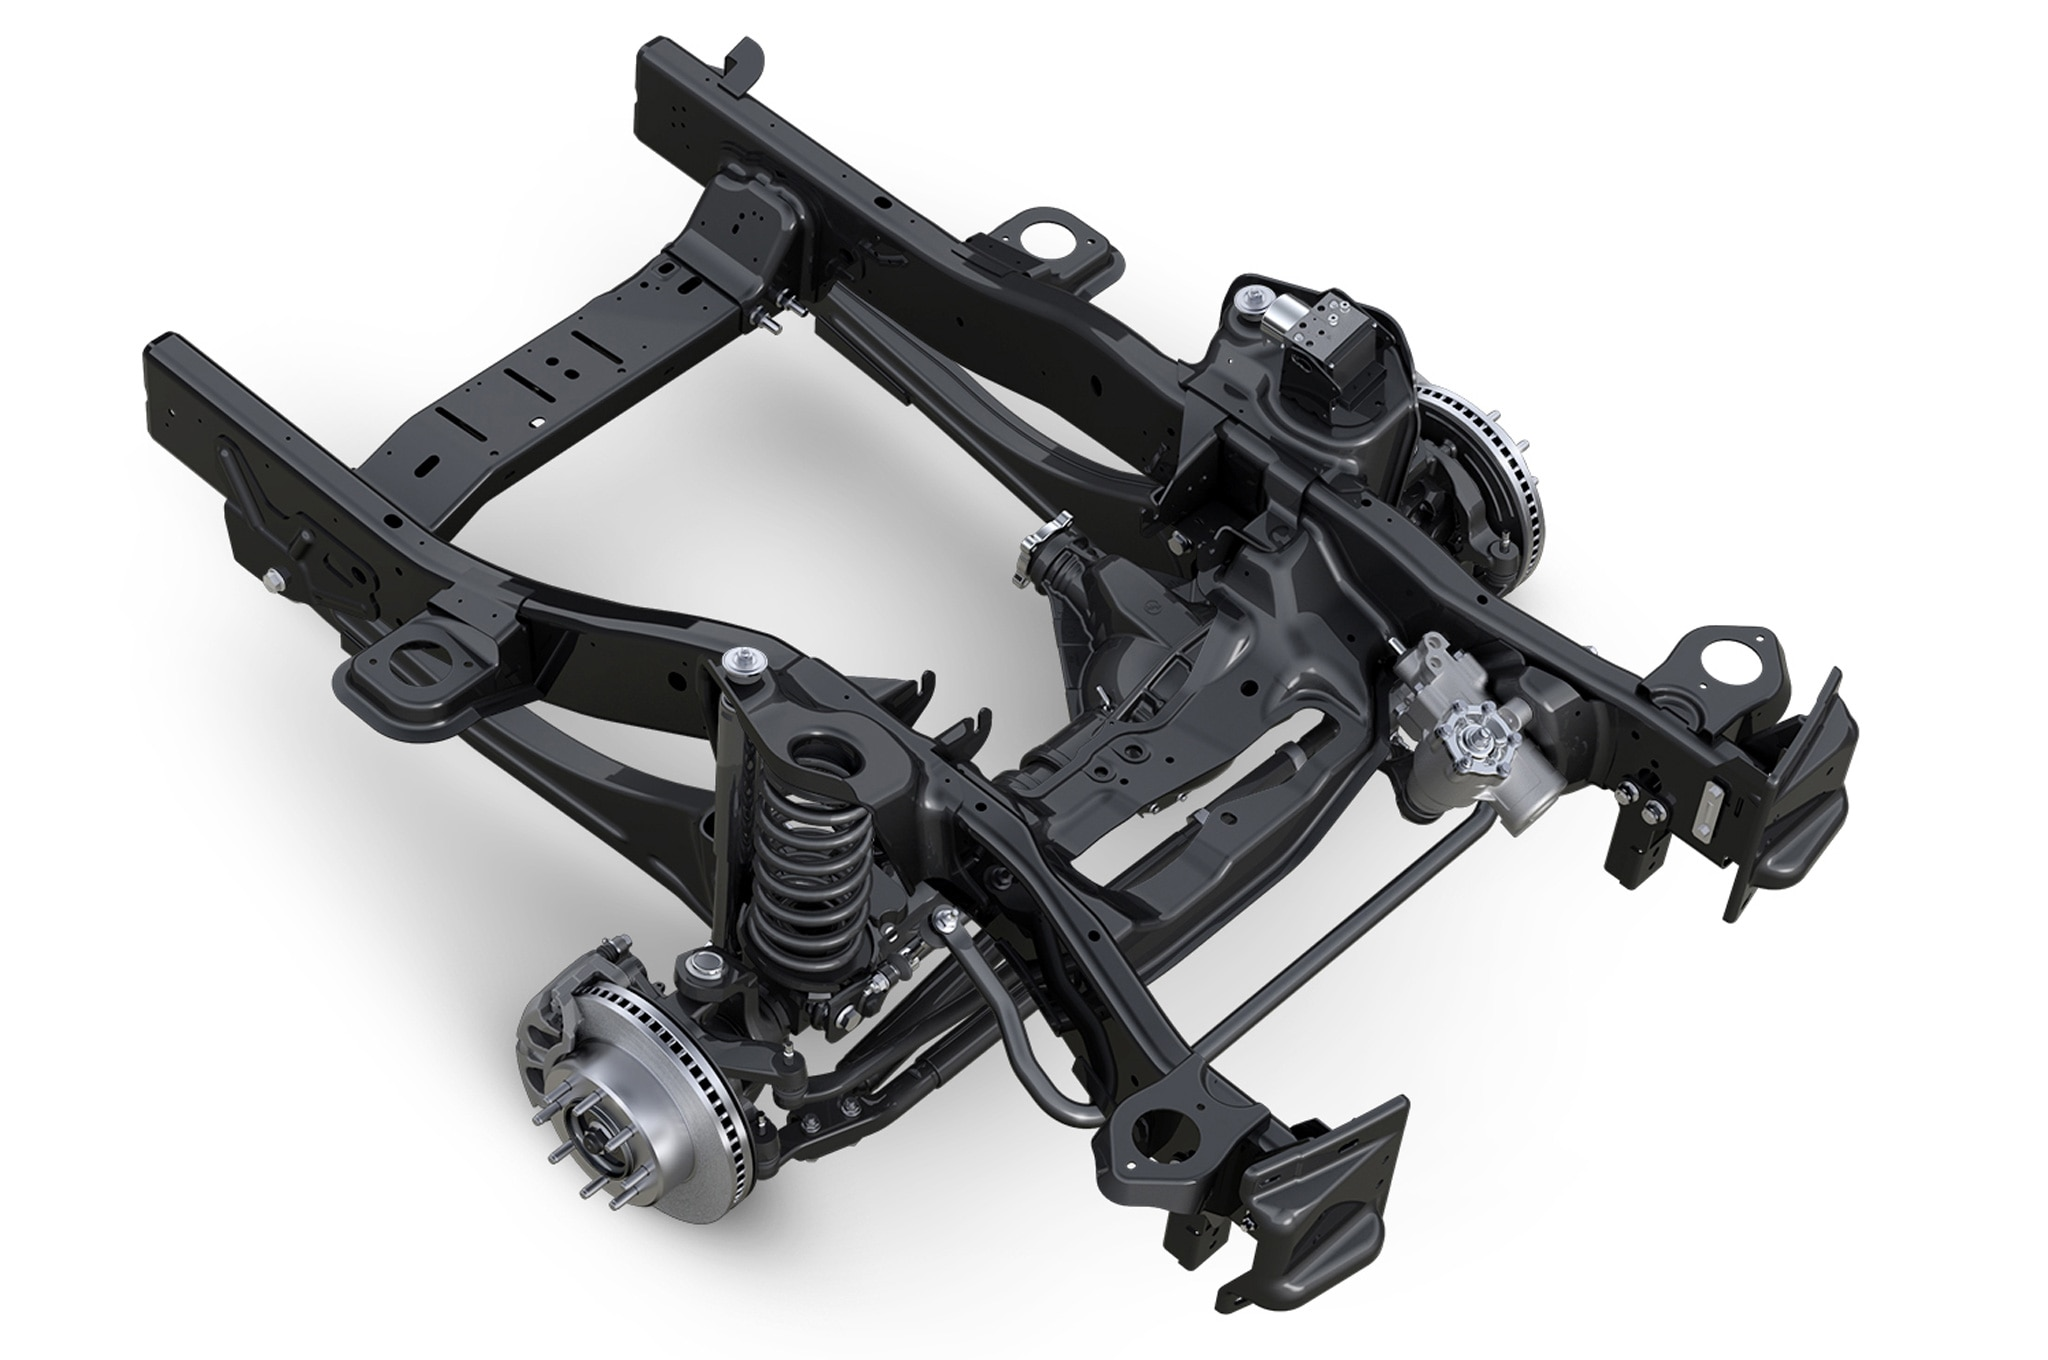 2014 Ram Heavy Duty Pickups Upgraded Gain Air Suspension